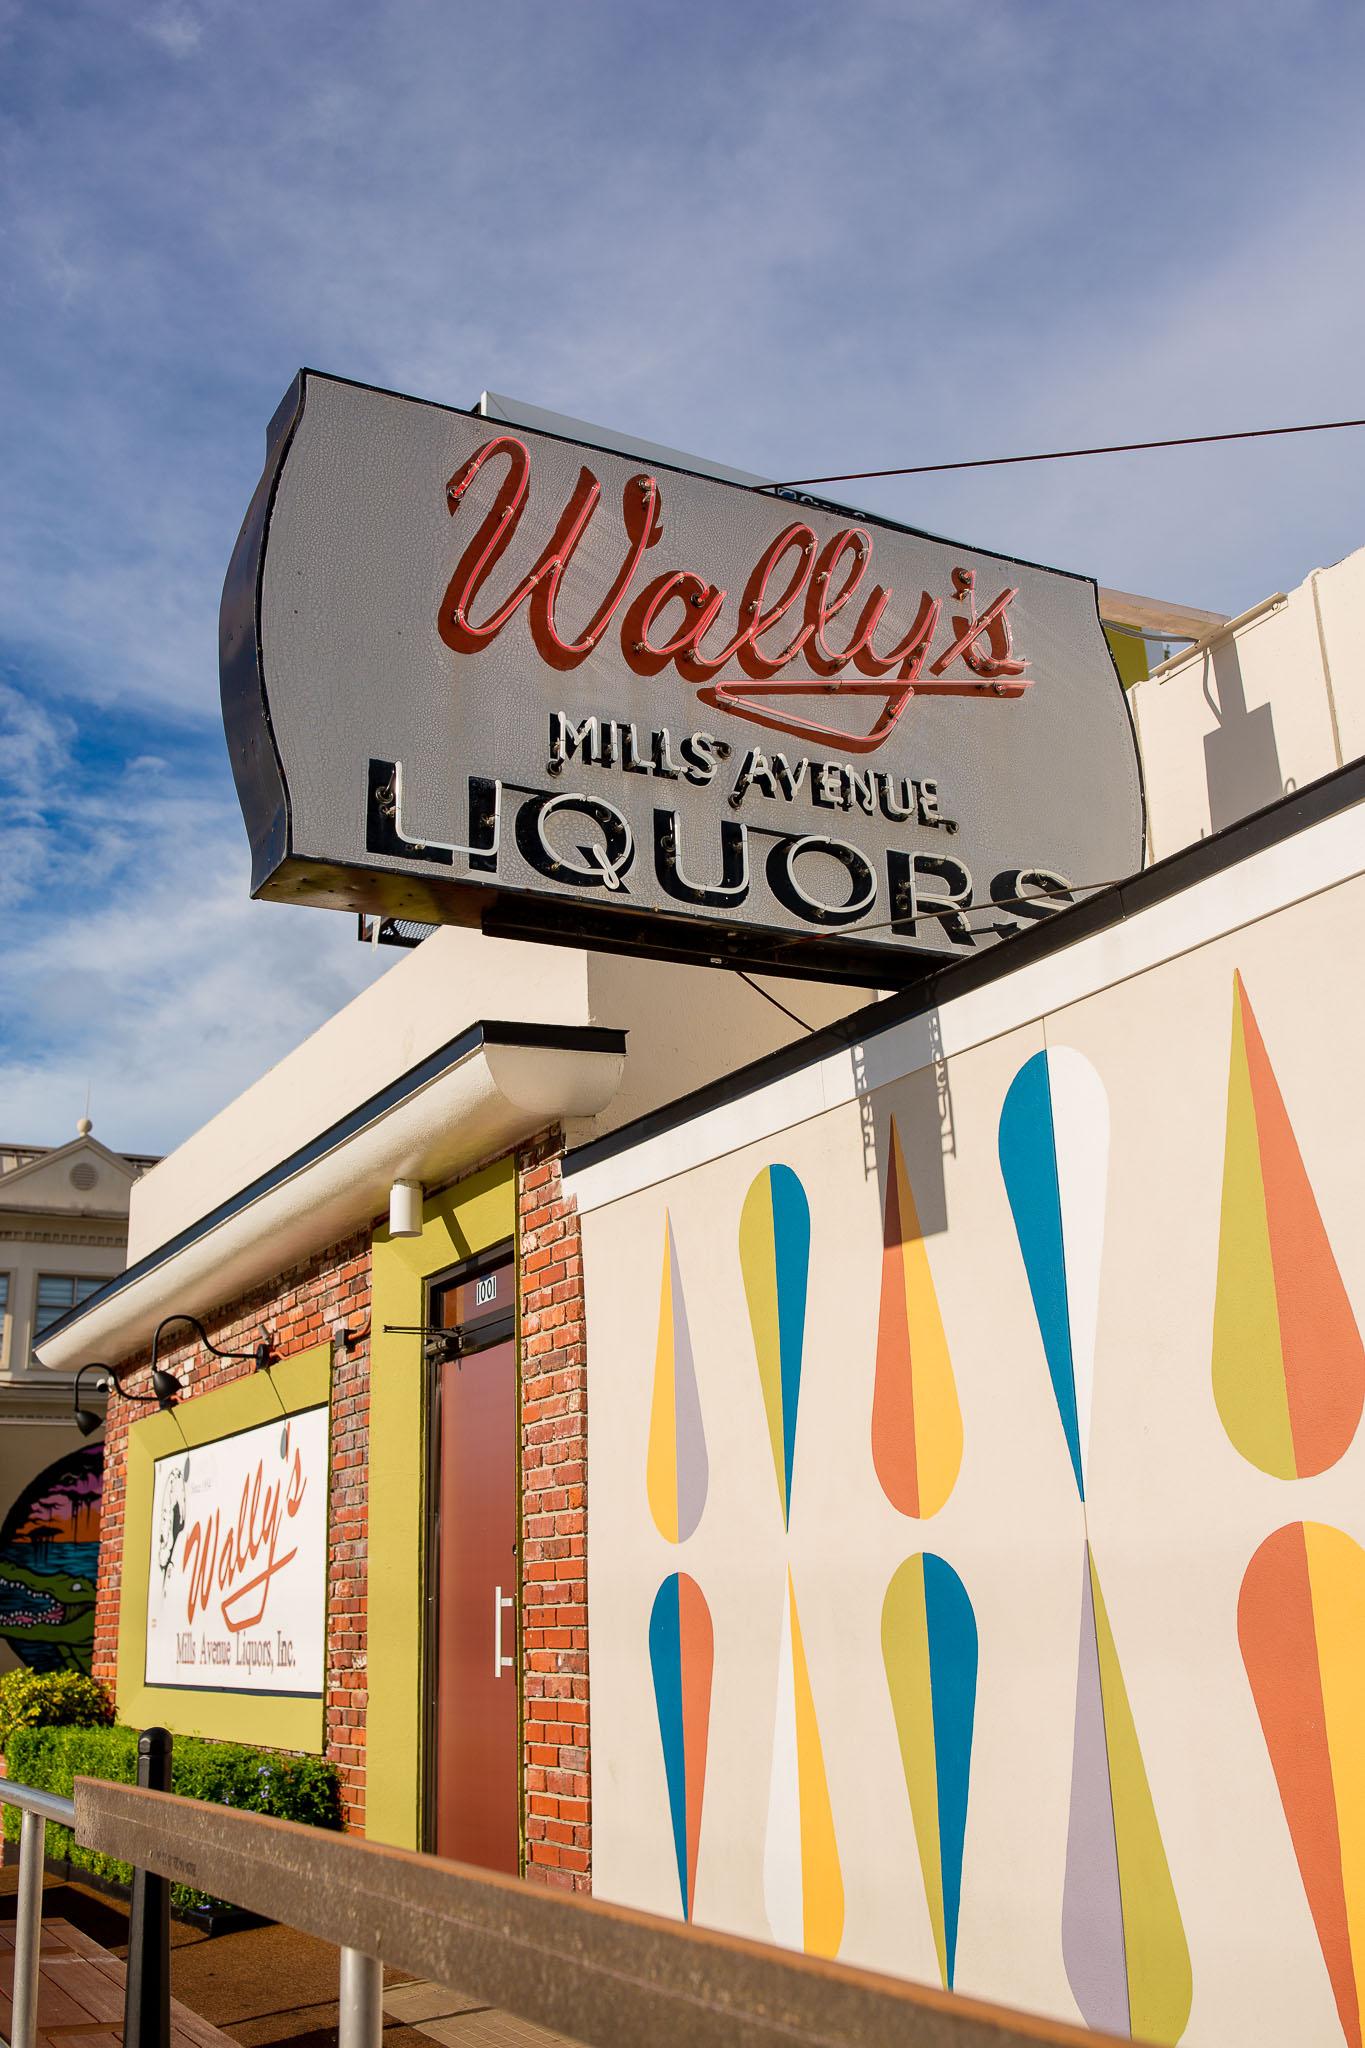 Wallys-Mills-Avenue-Liquors.jpg